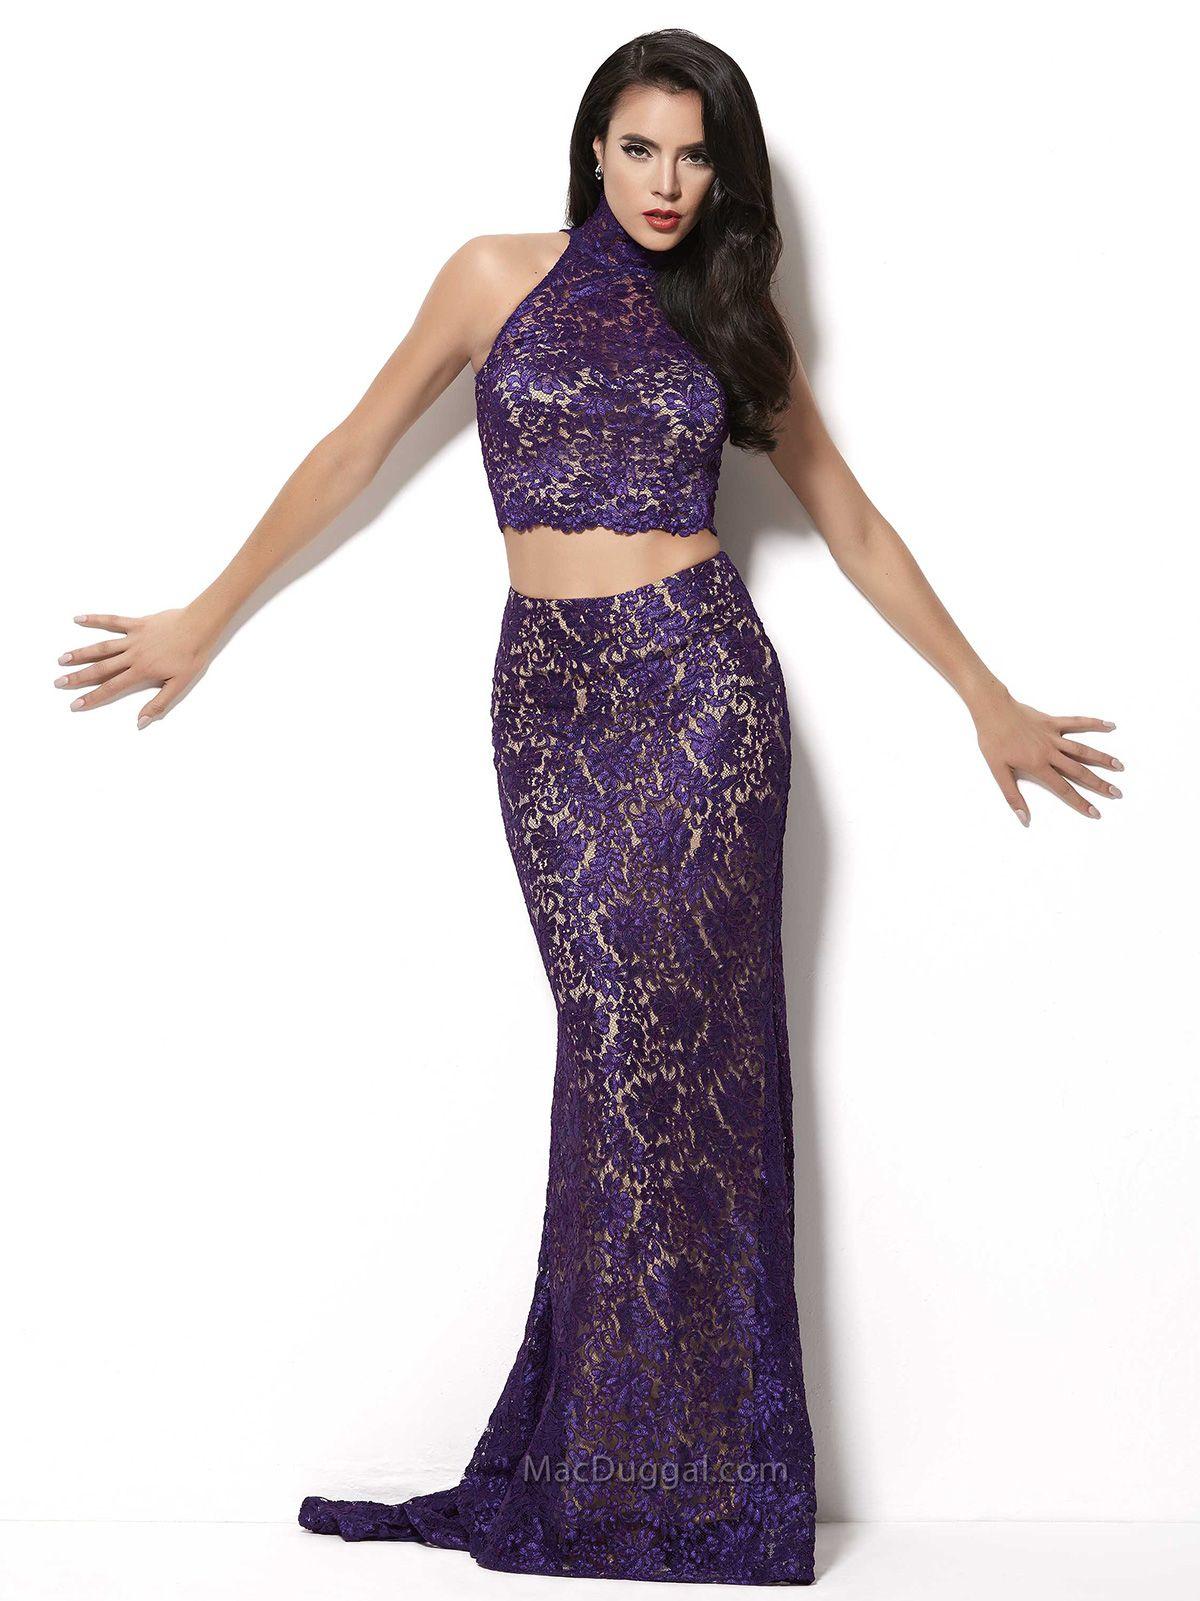 Mac Duggal Pageant Dresses